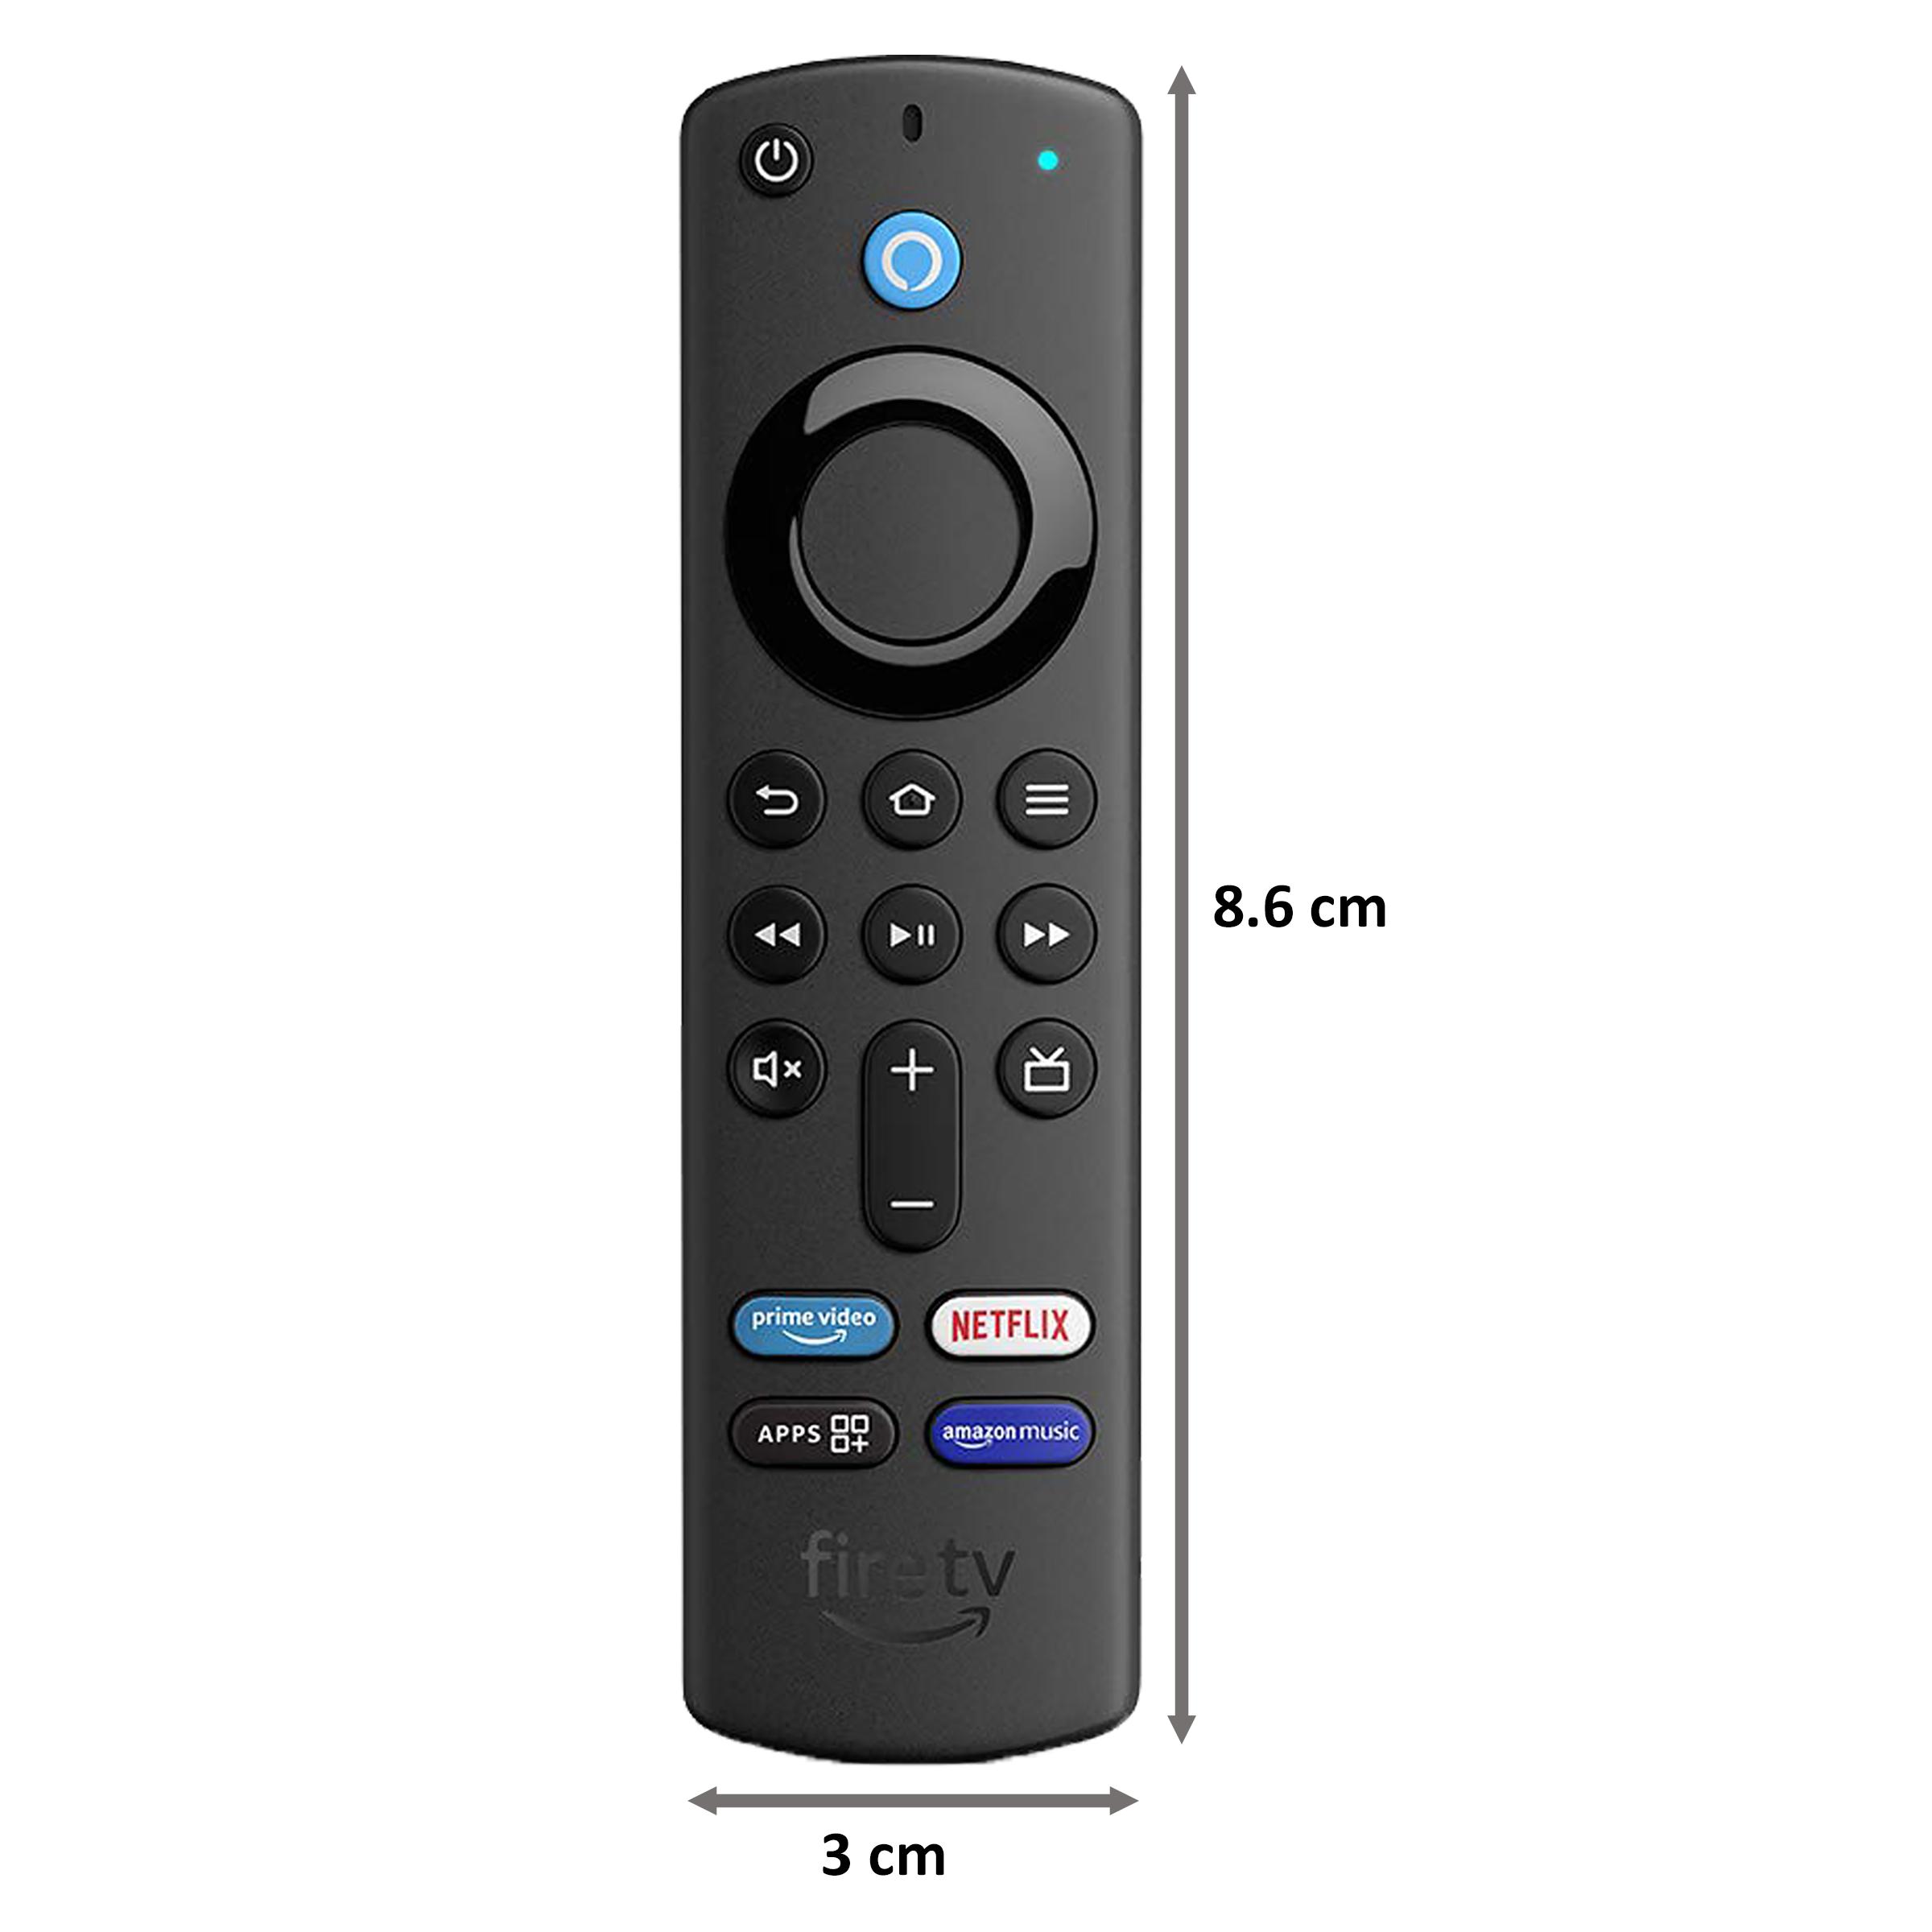 Amazon Fire TV Stick 3rd Gen with Alexa Voice Remote (Quad Core Processor, B08C1KQRR5, Black) 2